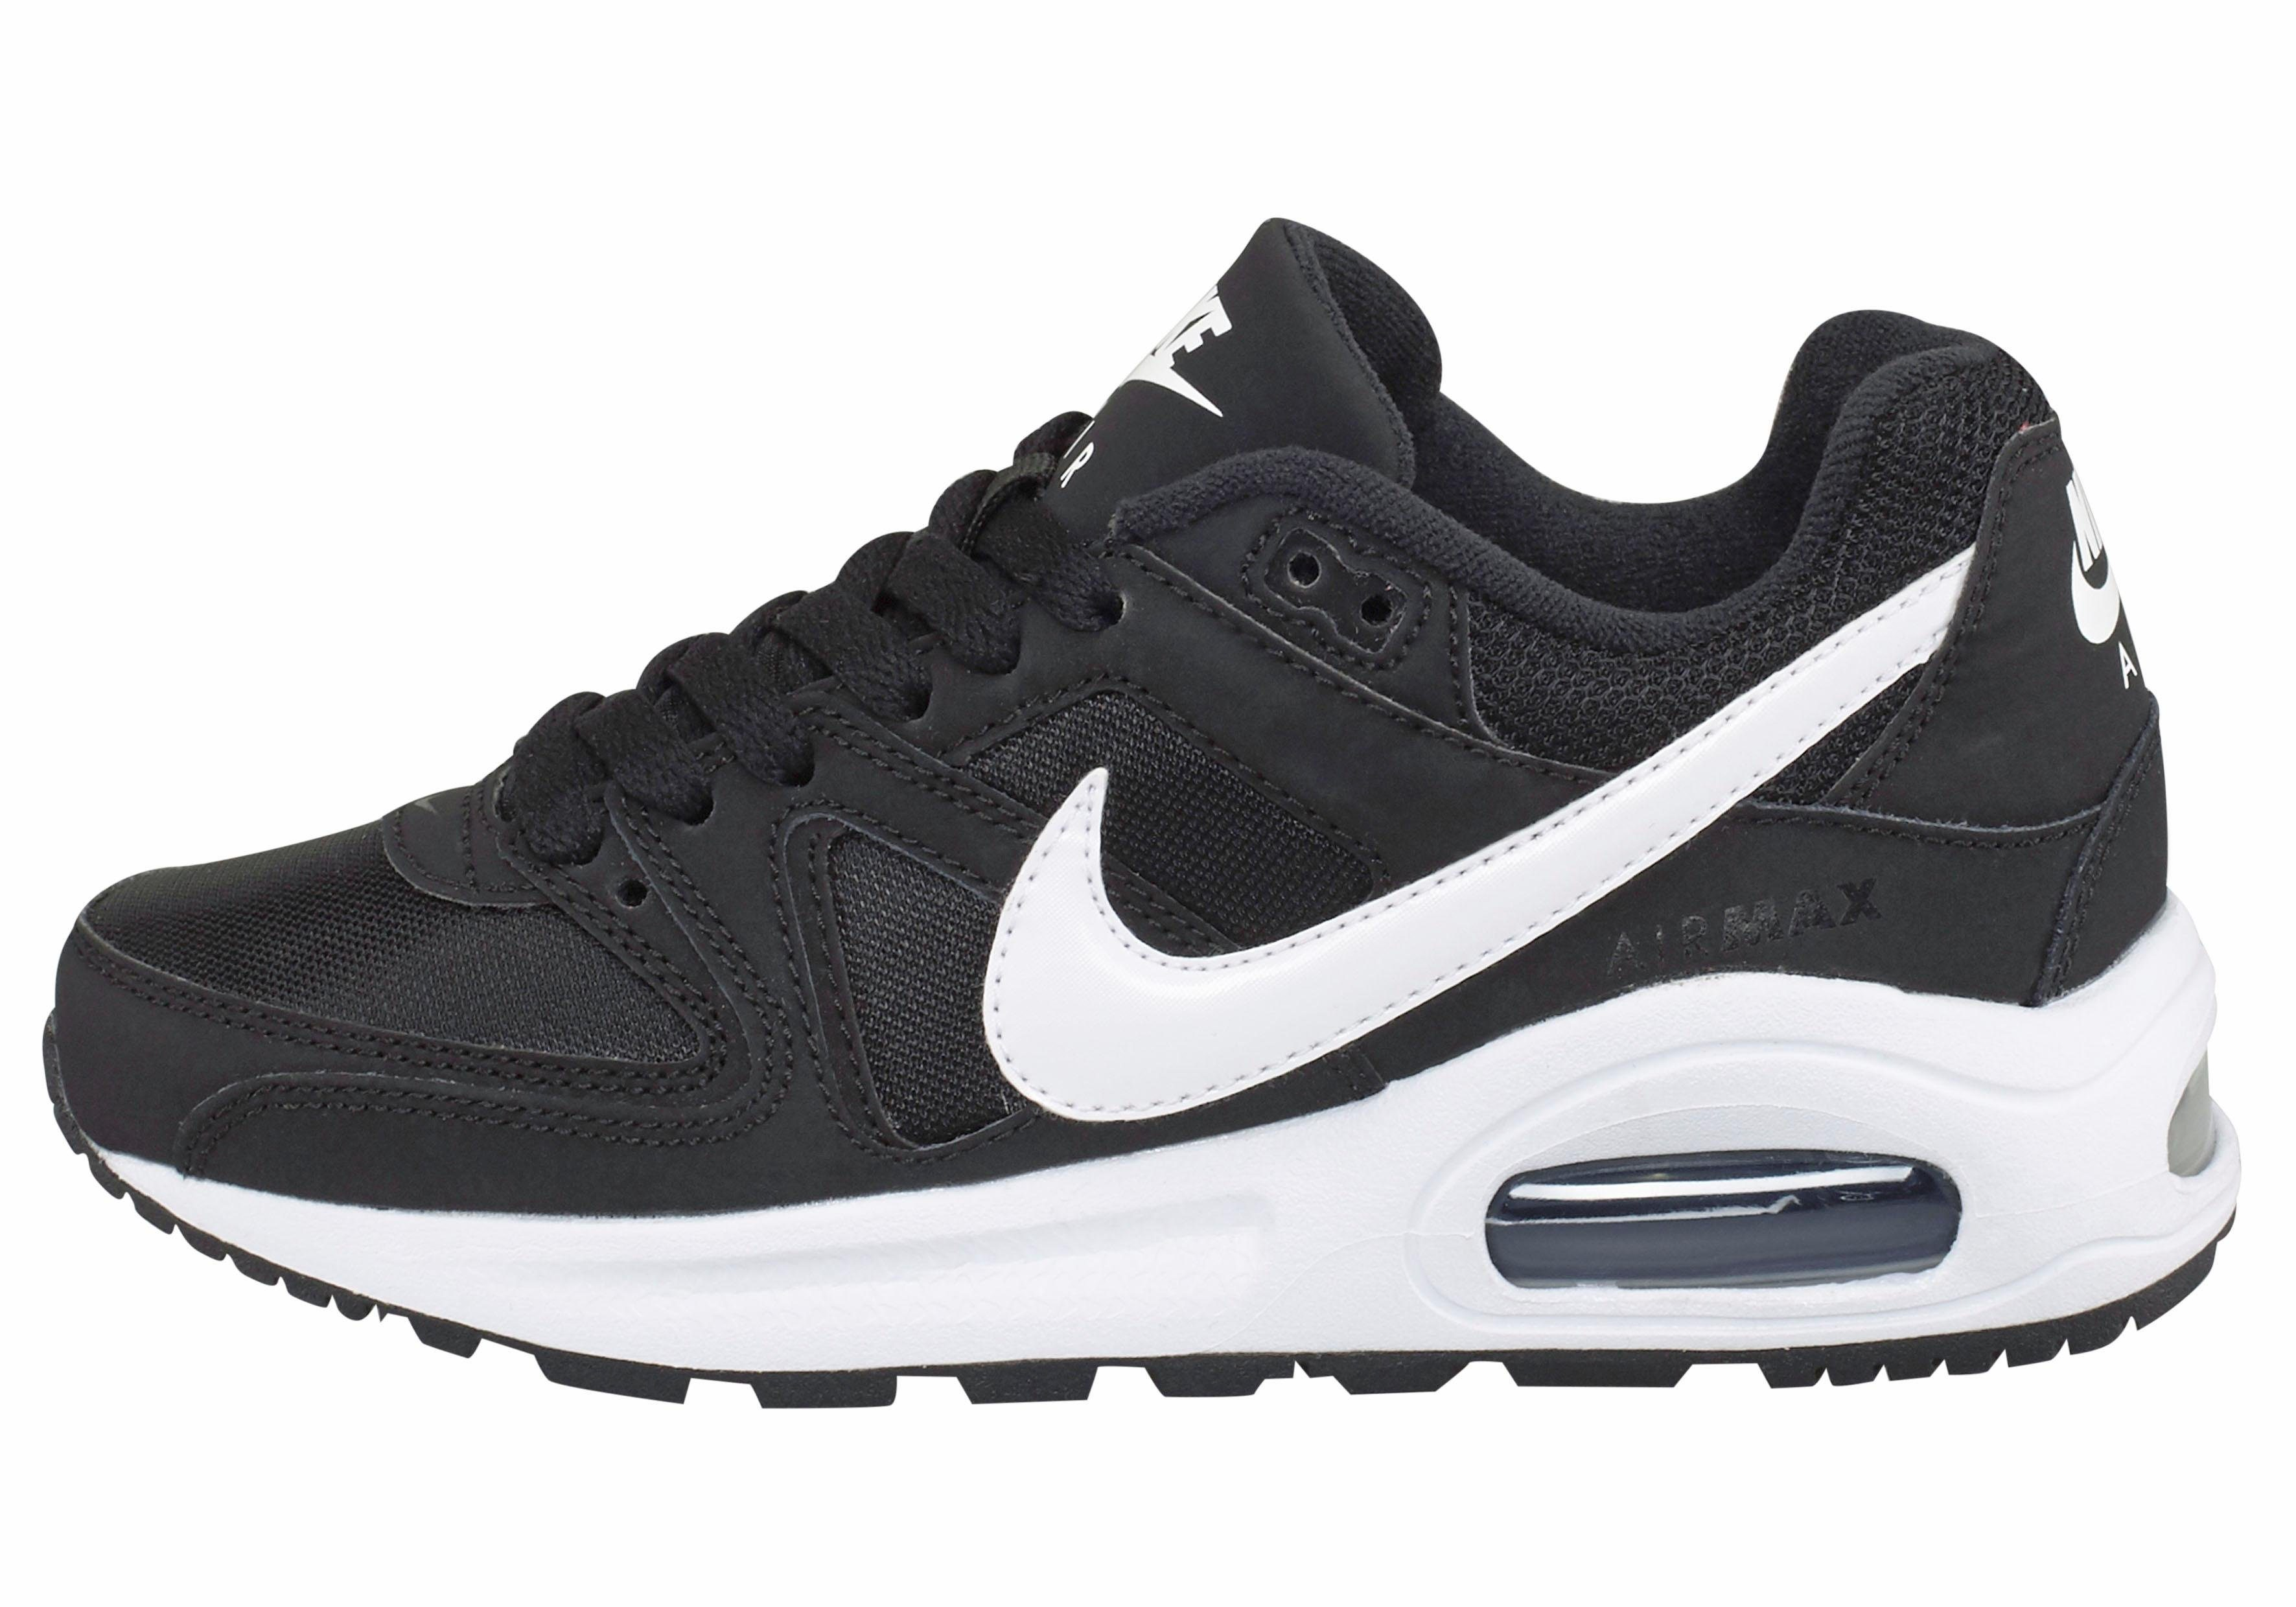 sneakers »Air Max Command Flex«